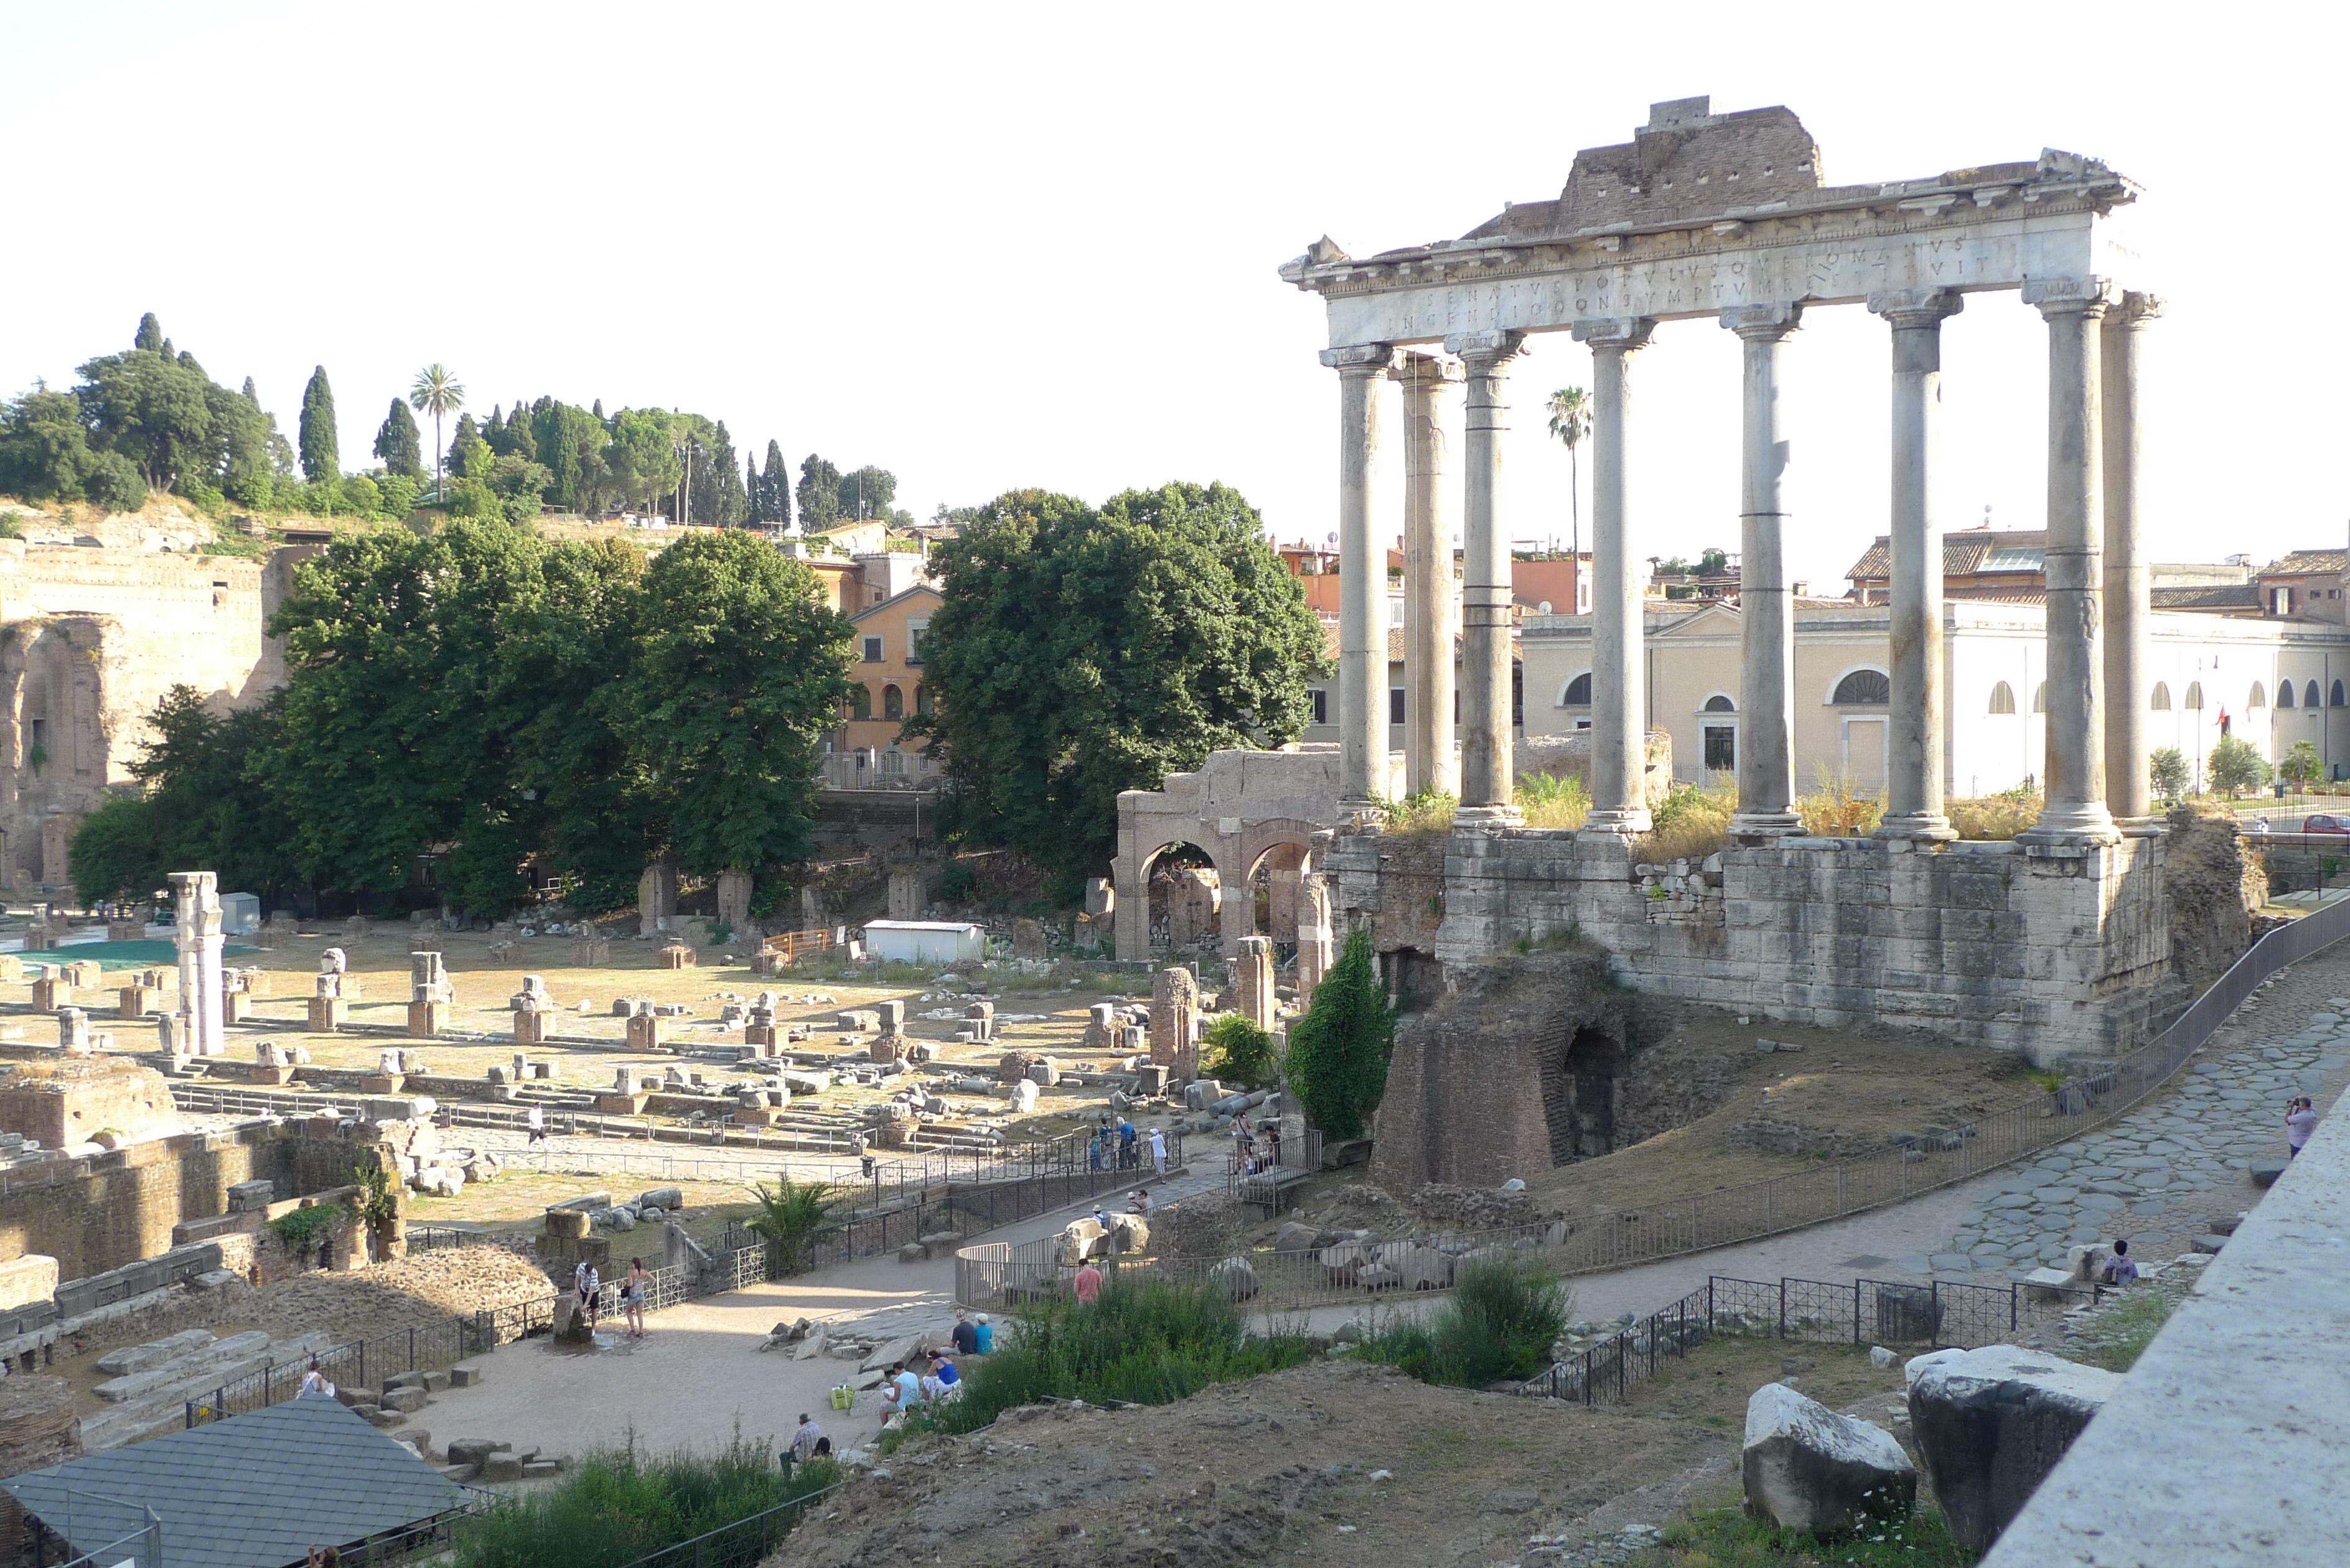 Foro Romano, Rome, Italy : 캄피돌리오 언덕가는 길에서 바라본 포로 로마노 풍경.